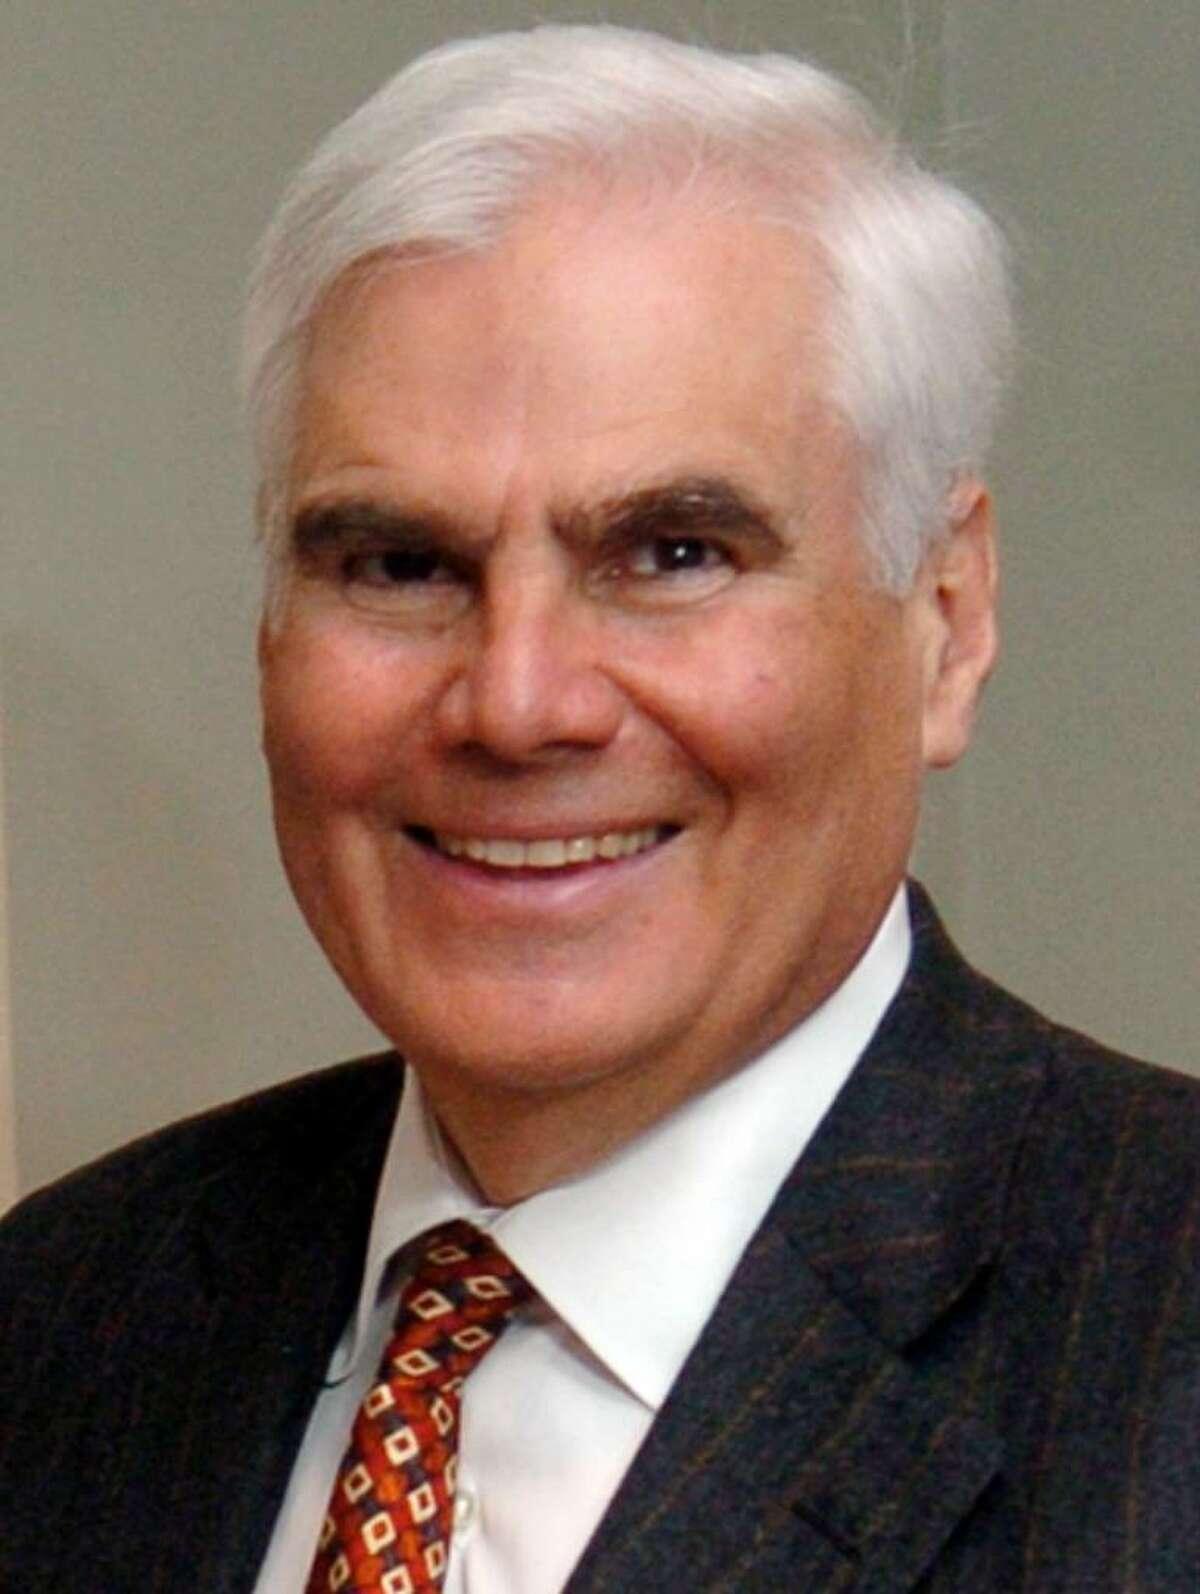 Robert D. Scinto.